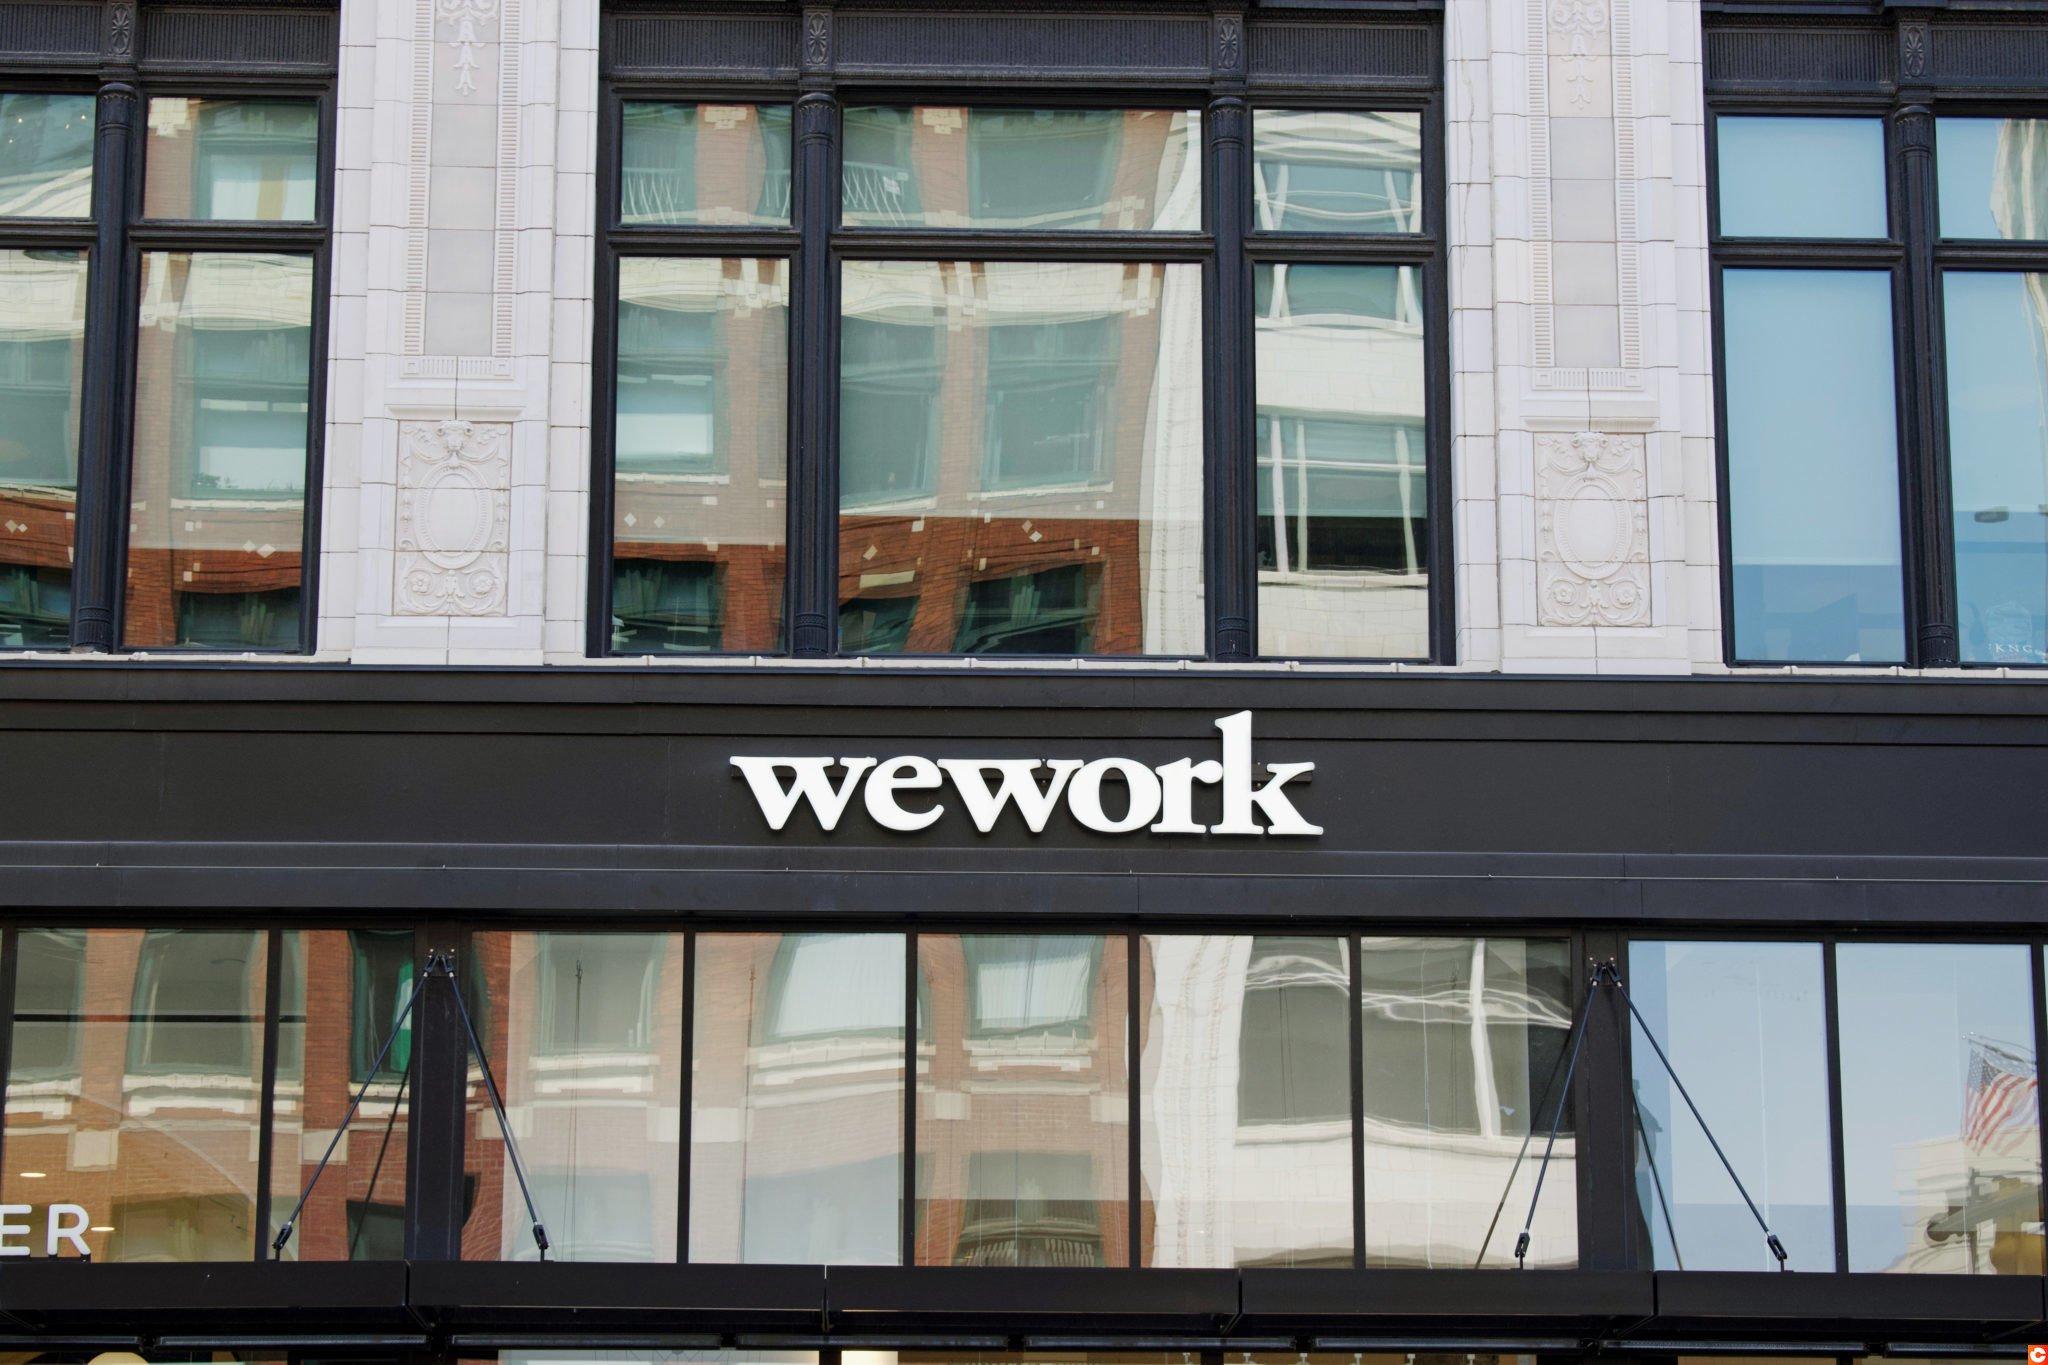 DETROIT, MICHIGAN/USA July 26, 2019: Wework exterior sign in downtown Detroit, Michigan, July 26, 2019